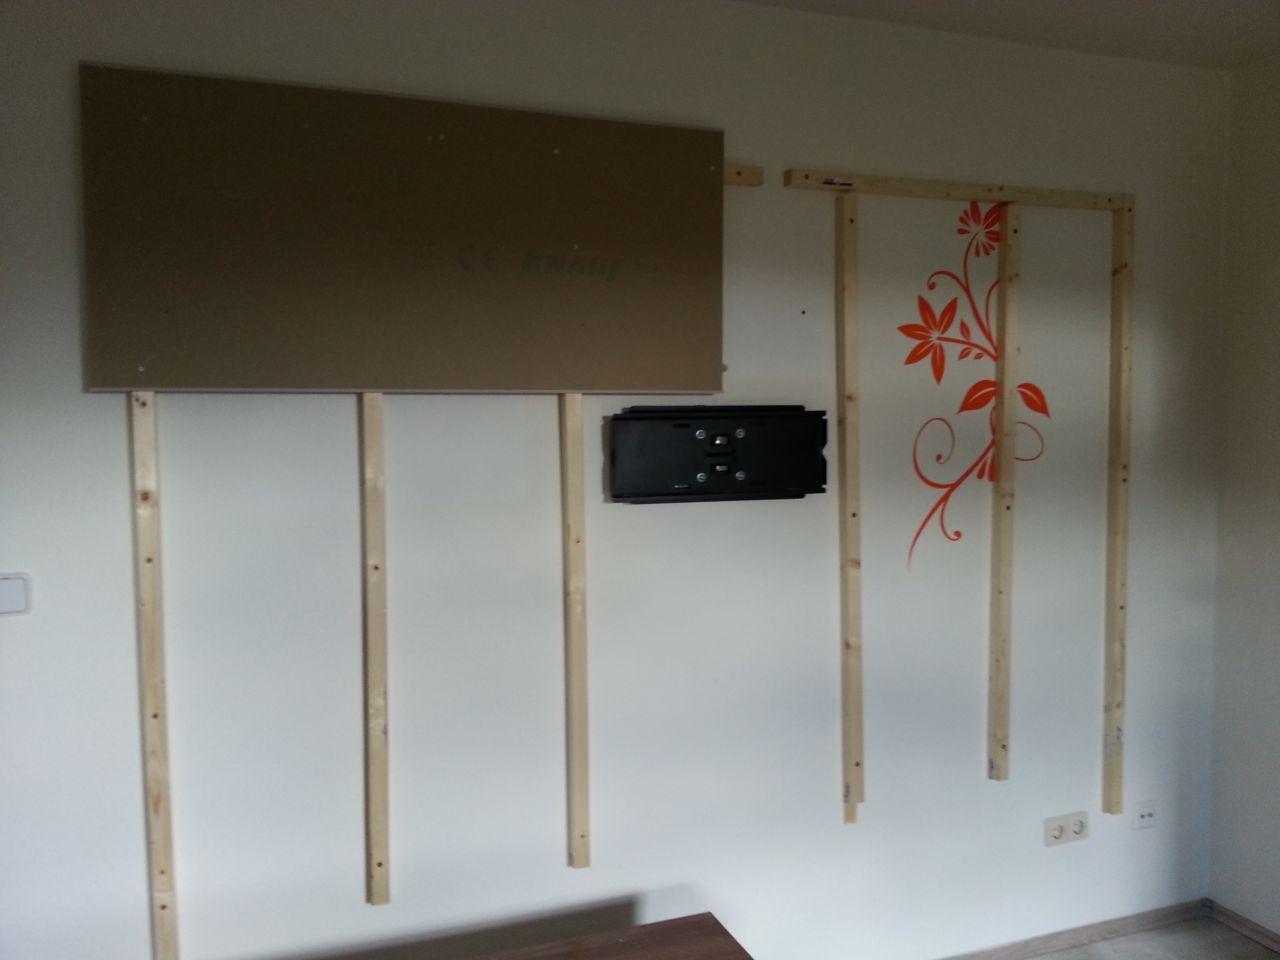 Wohnwand Tv Wand Selbst Gebaut Teil 1 Tv Wand Selber Bauen